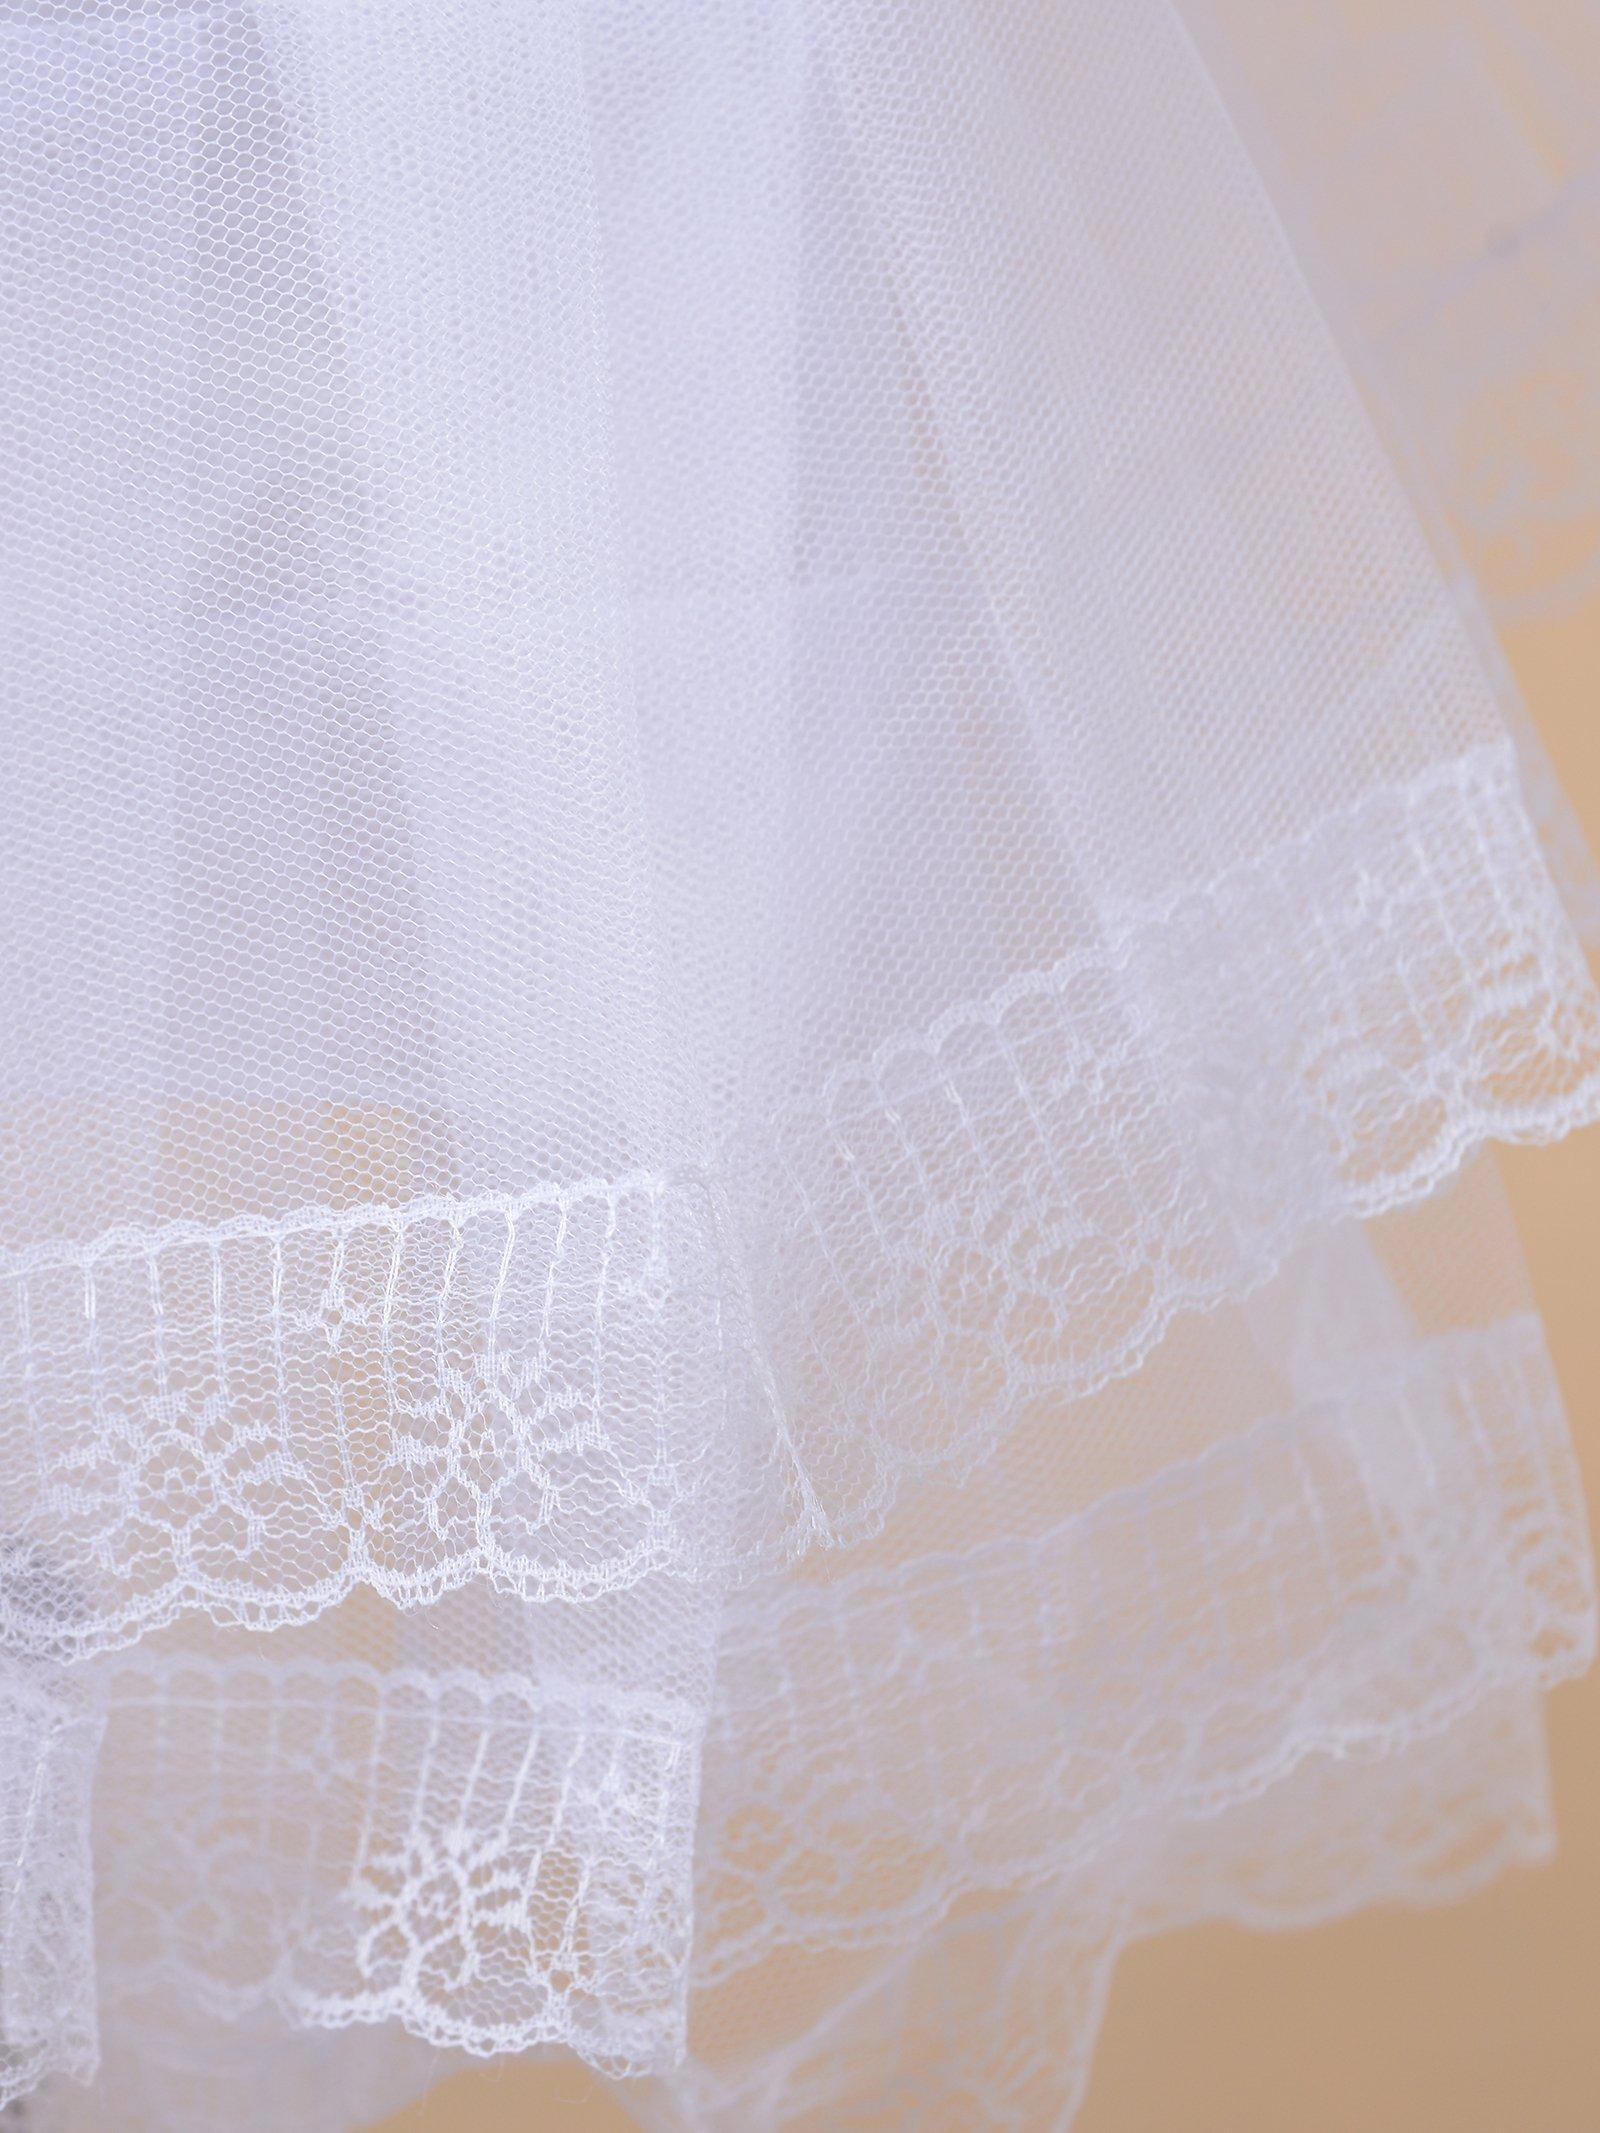 Remedios Kids Mini White Petticoat Flower Girl Wedding Underskirt Cocktail Dress Crinoline Slip White by Remedios (Image #6)